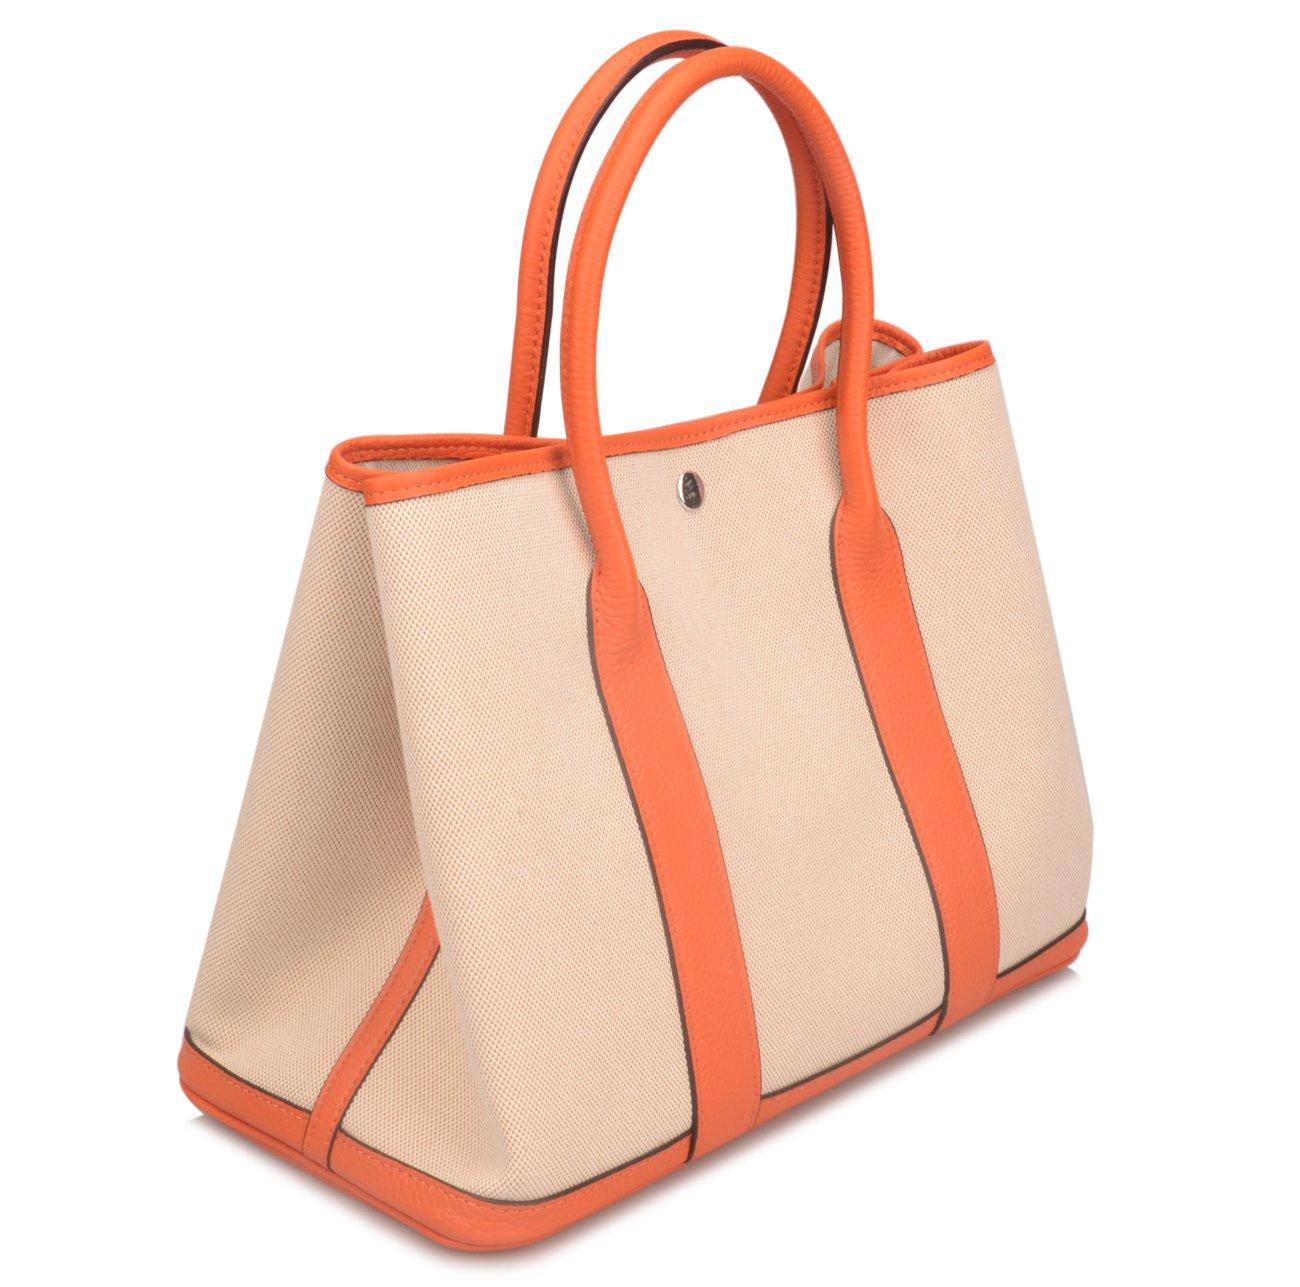 Ainifeel Women's Genuine Leather Top Handle Handbag Shopping Bag Tote Bag (Orange(leather+canvas))